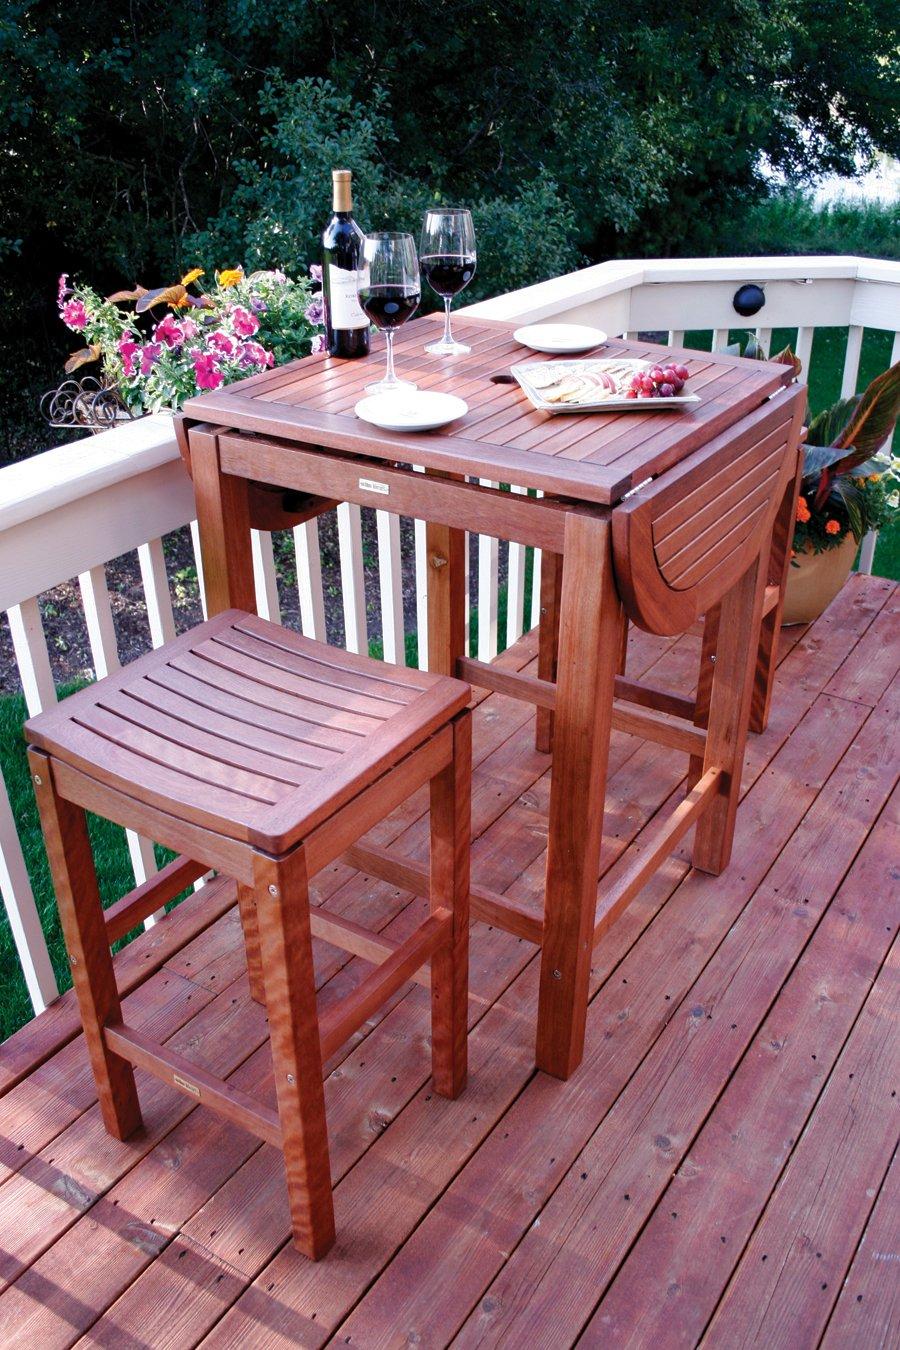 Delightful Amazon.com : Patio Pub Height Super Stool, 2 Pack : Folding Patio Chairs :  Garden U0026 Outdoor